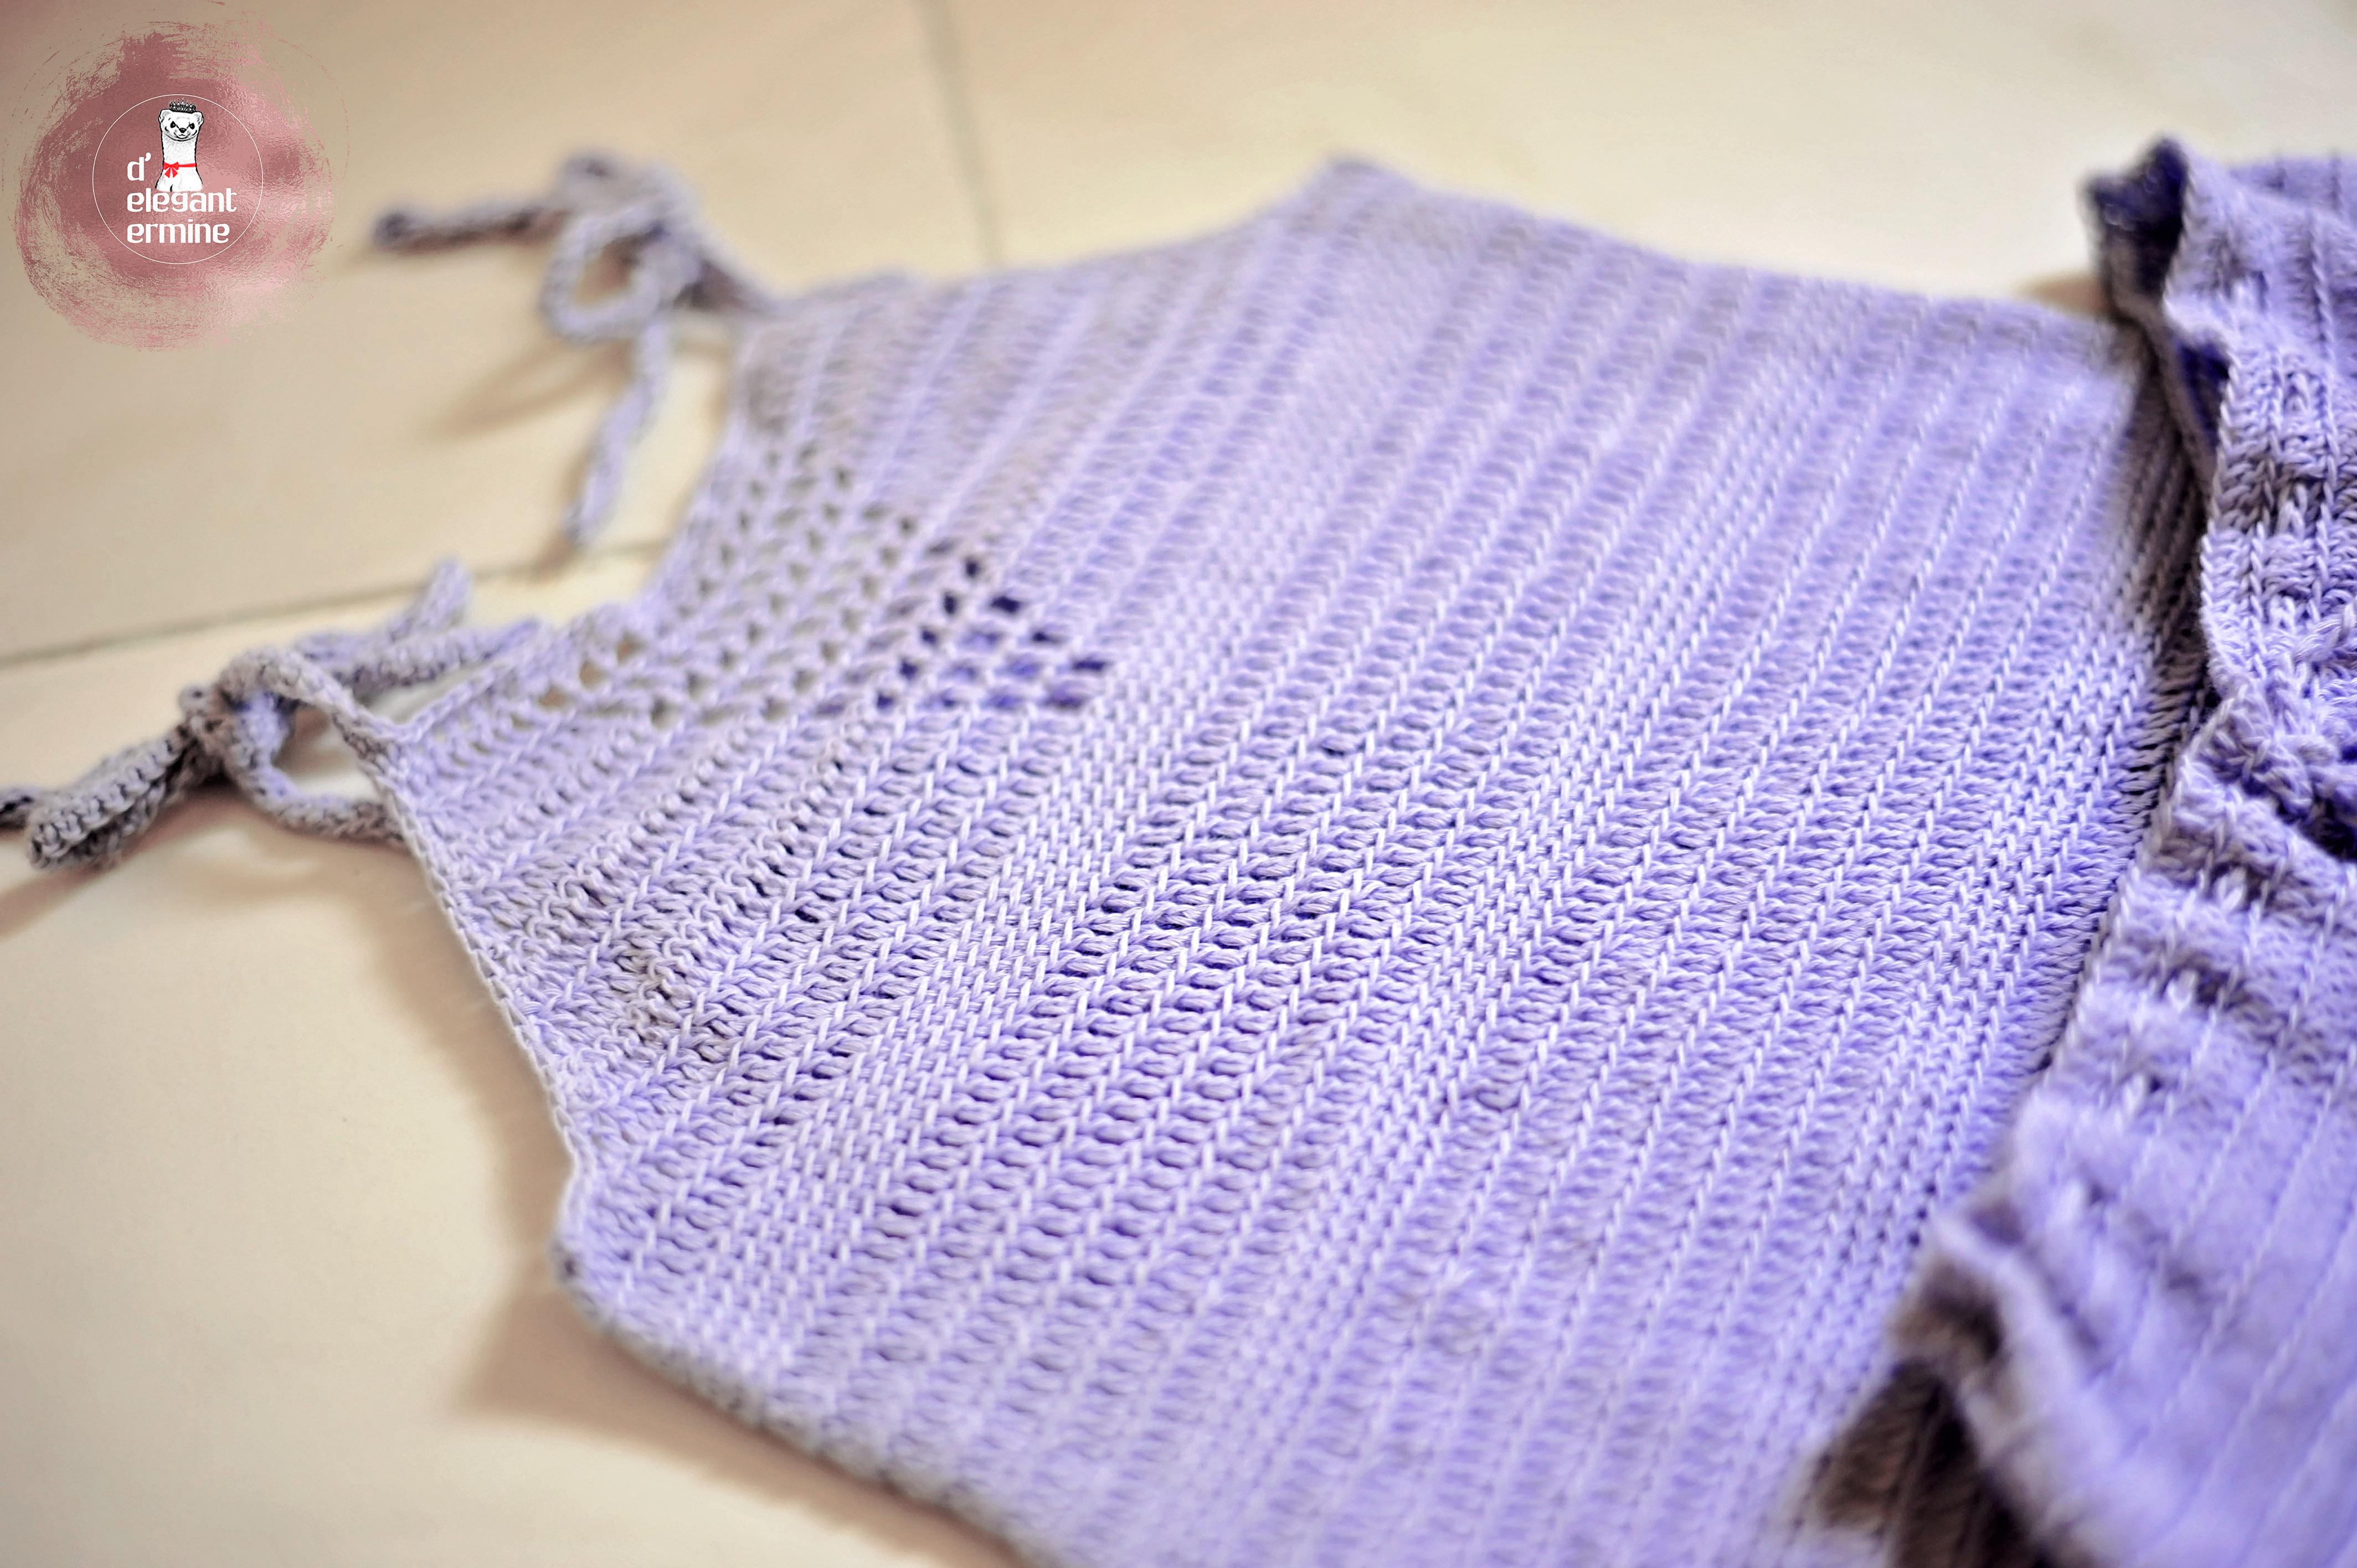 D' Elegant Ermine Crochets